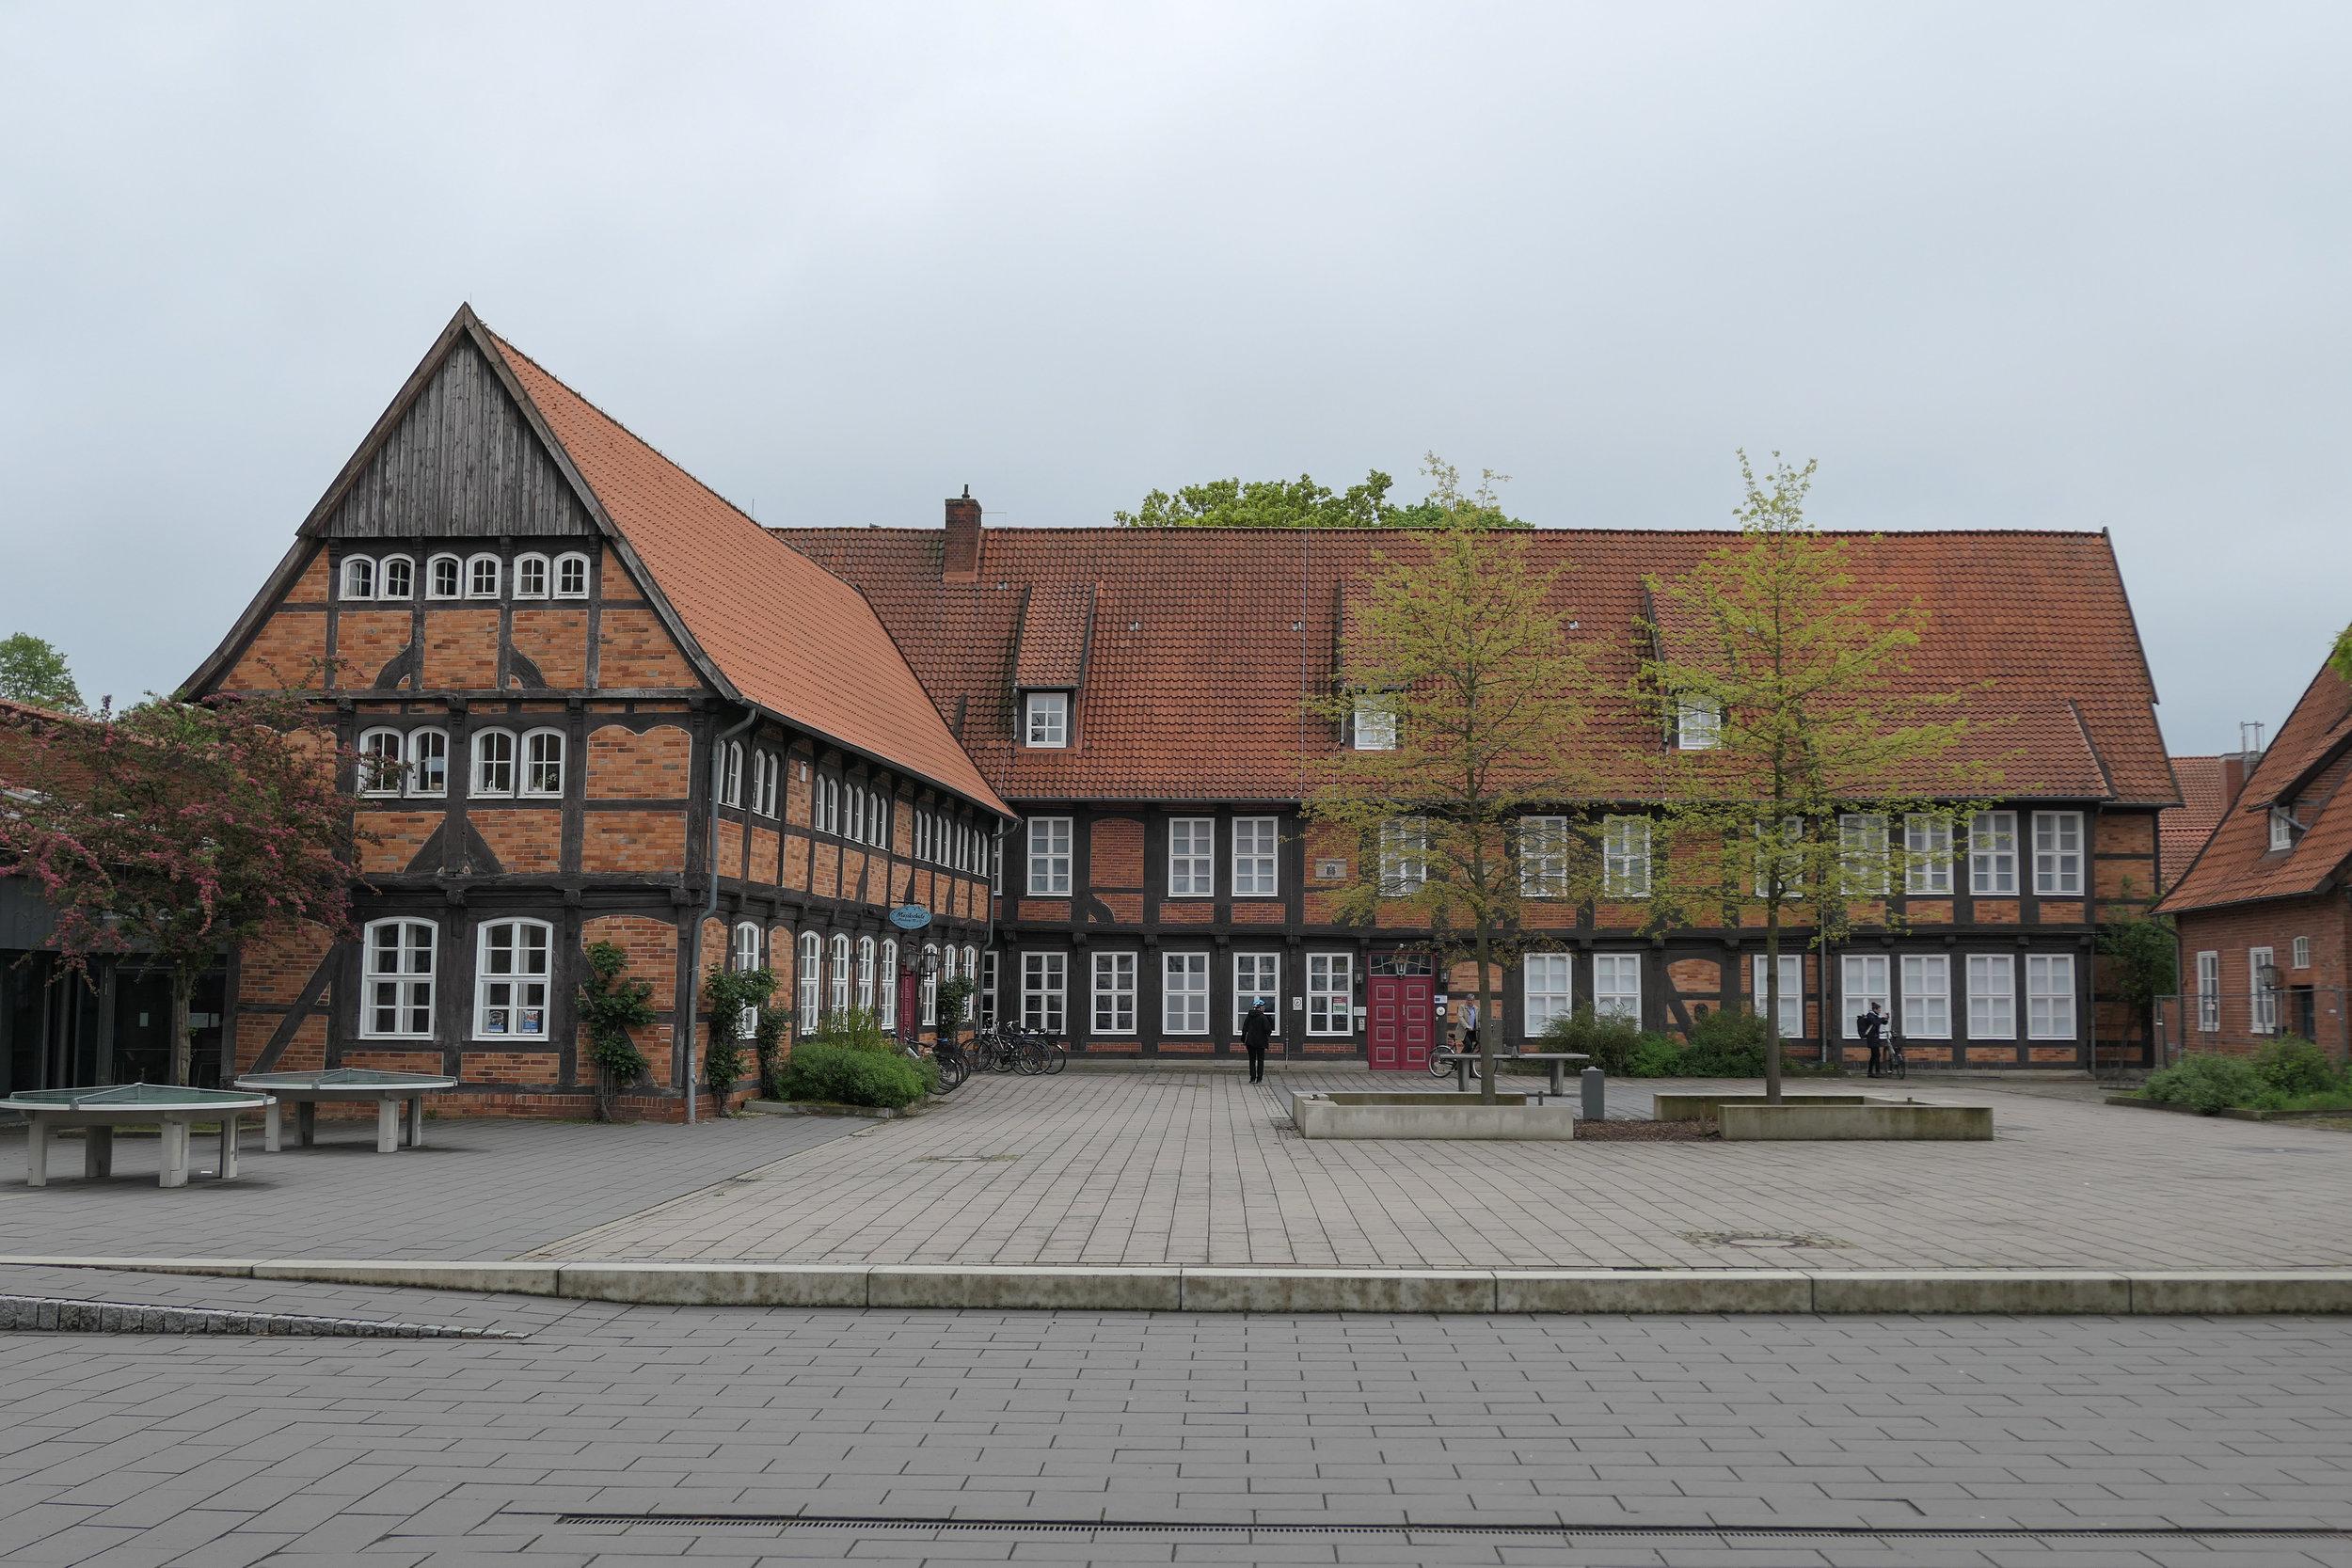 maiwanderfahrt-weser-2019-2_0113_2019-04-29_15-47-20.jpg